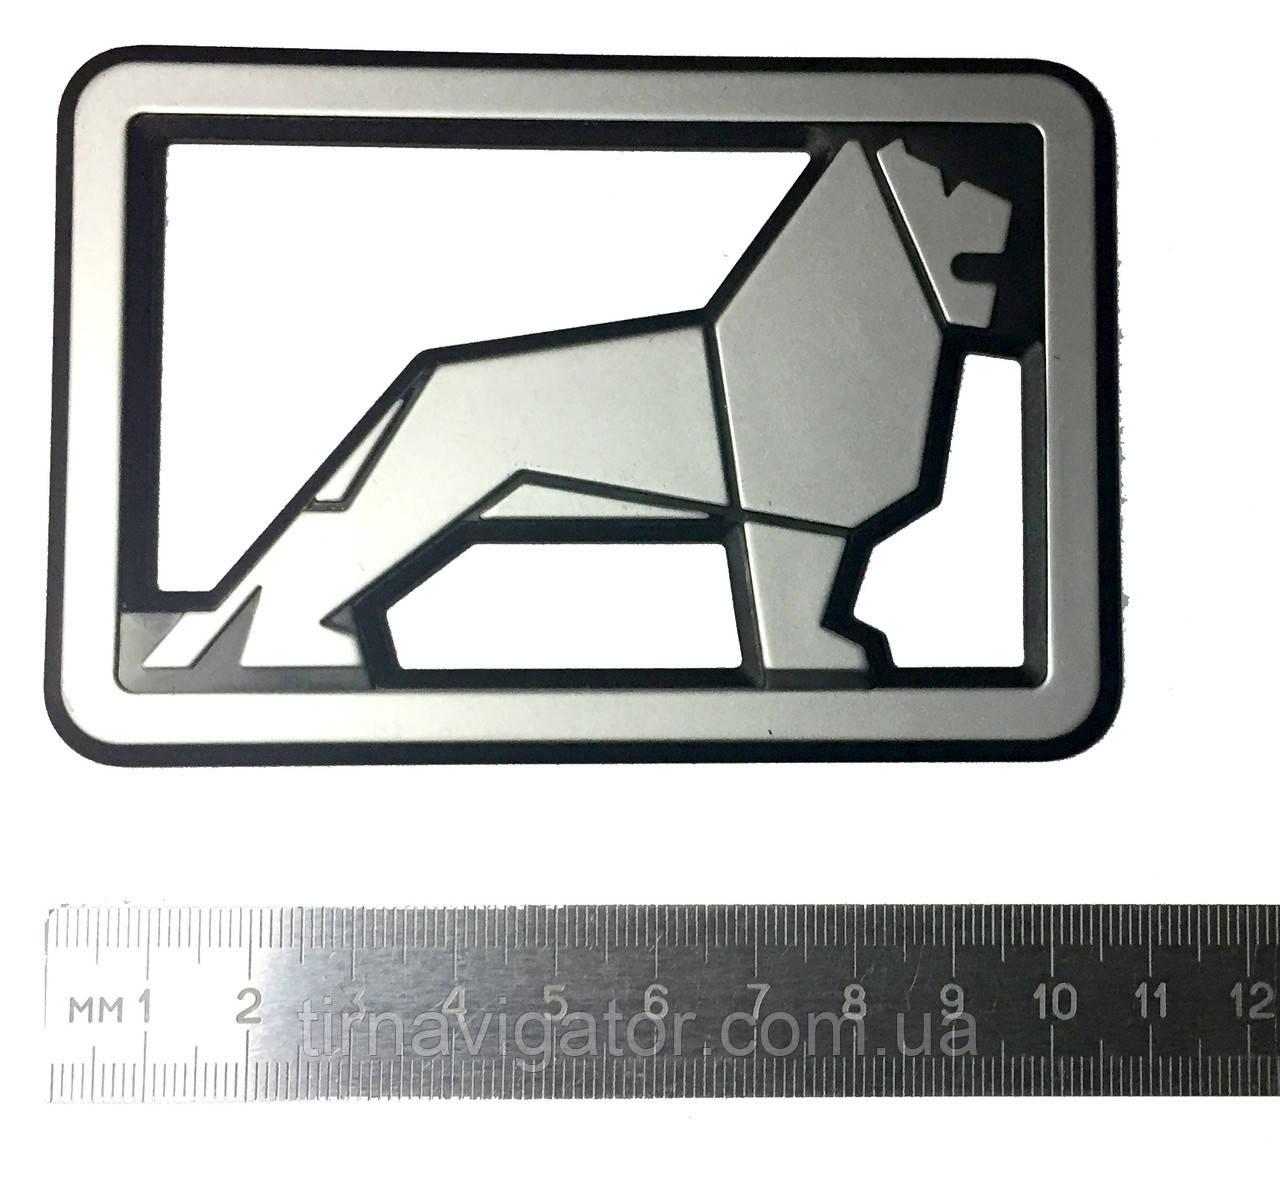 Эмблема логотип MAN 108*73 мм.